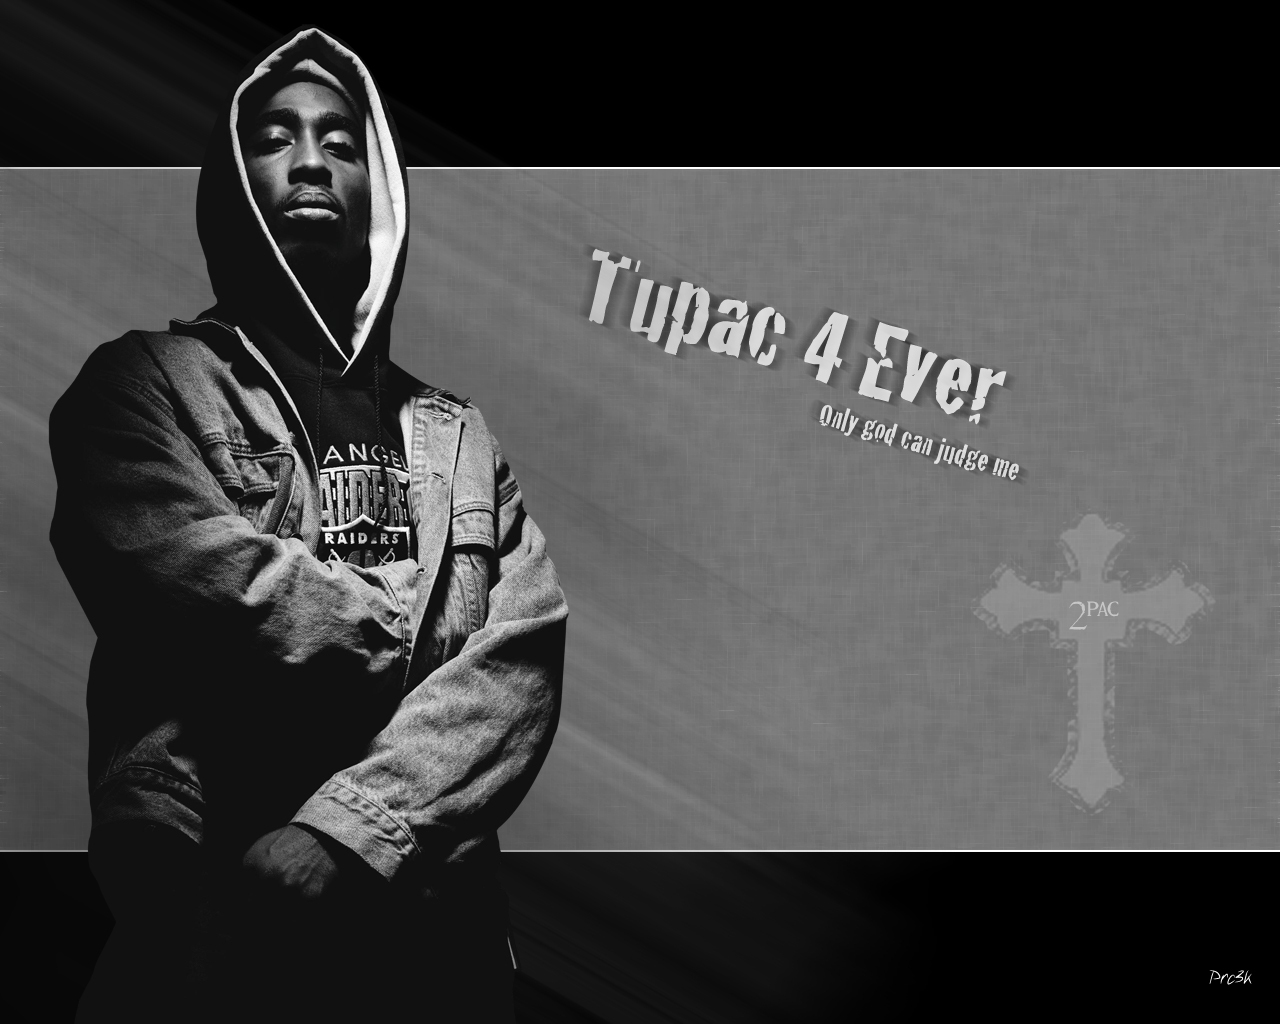 75 Tupac Amaru Shakur Wallpapers On Wallpapersafari